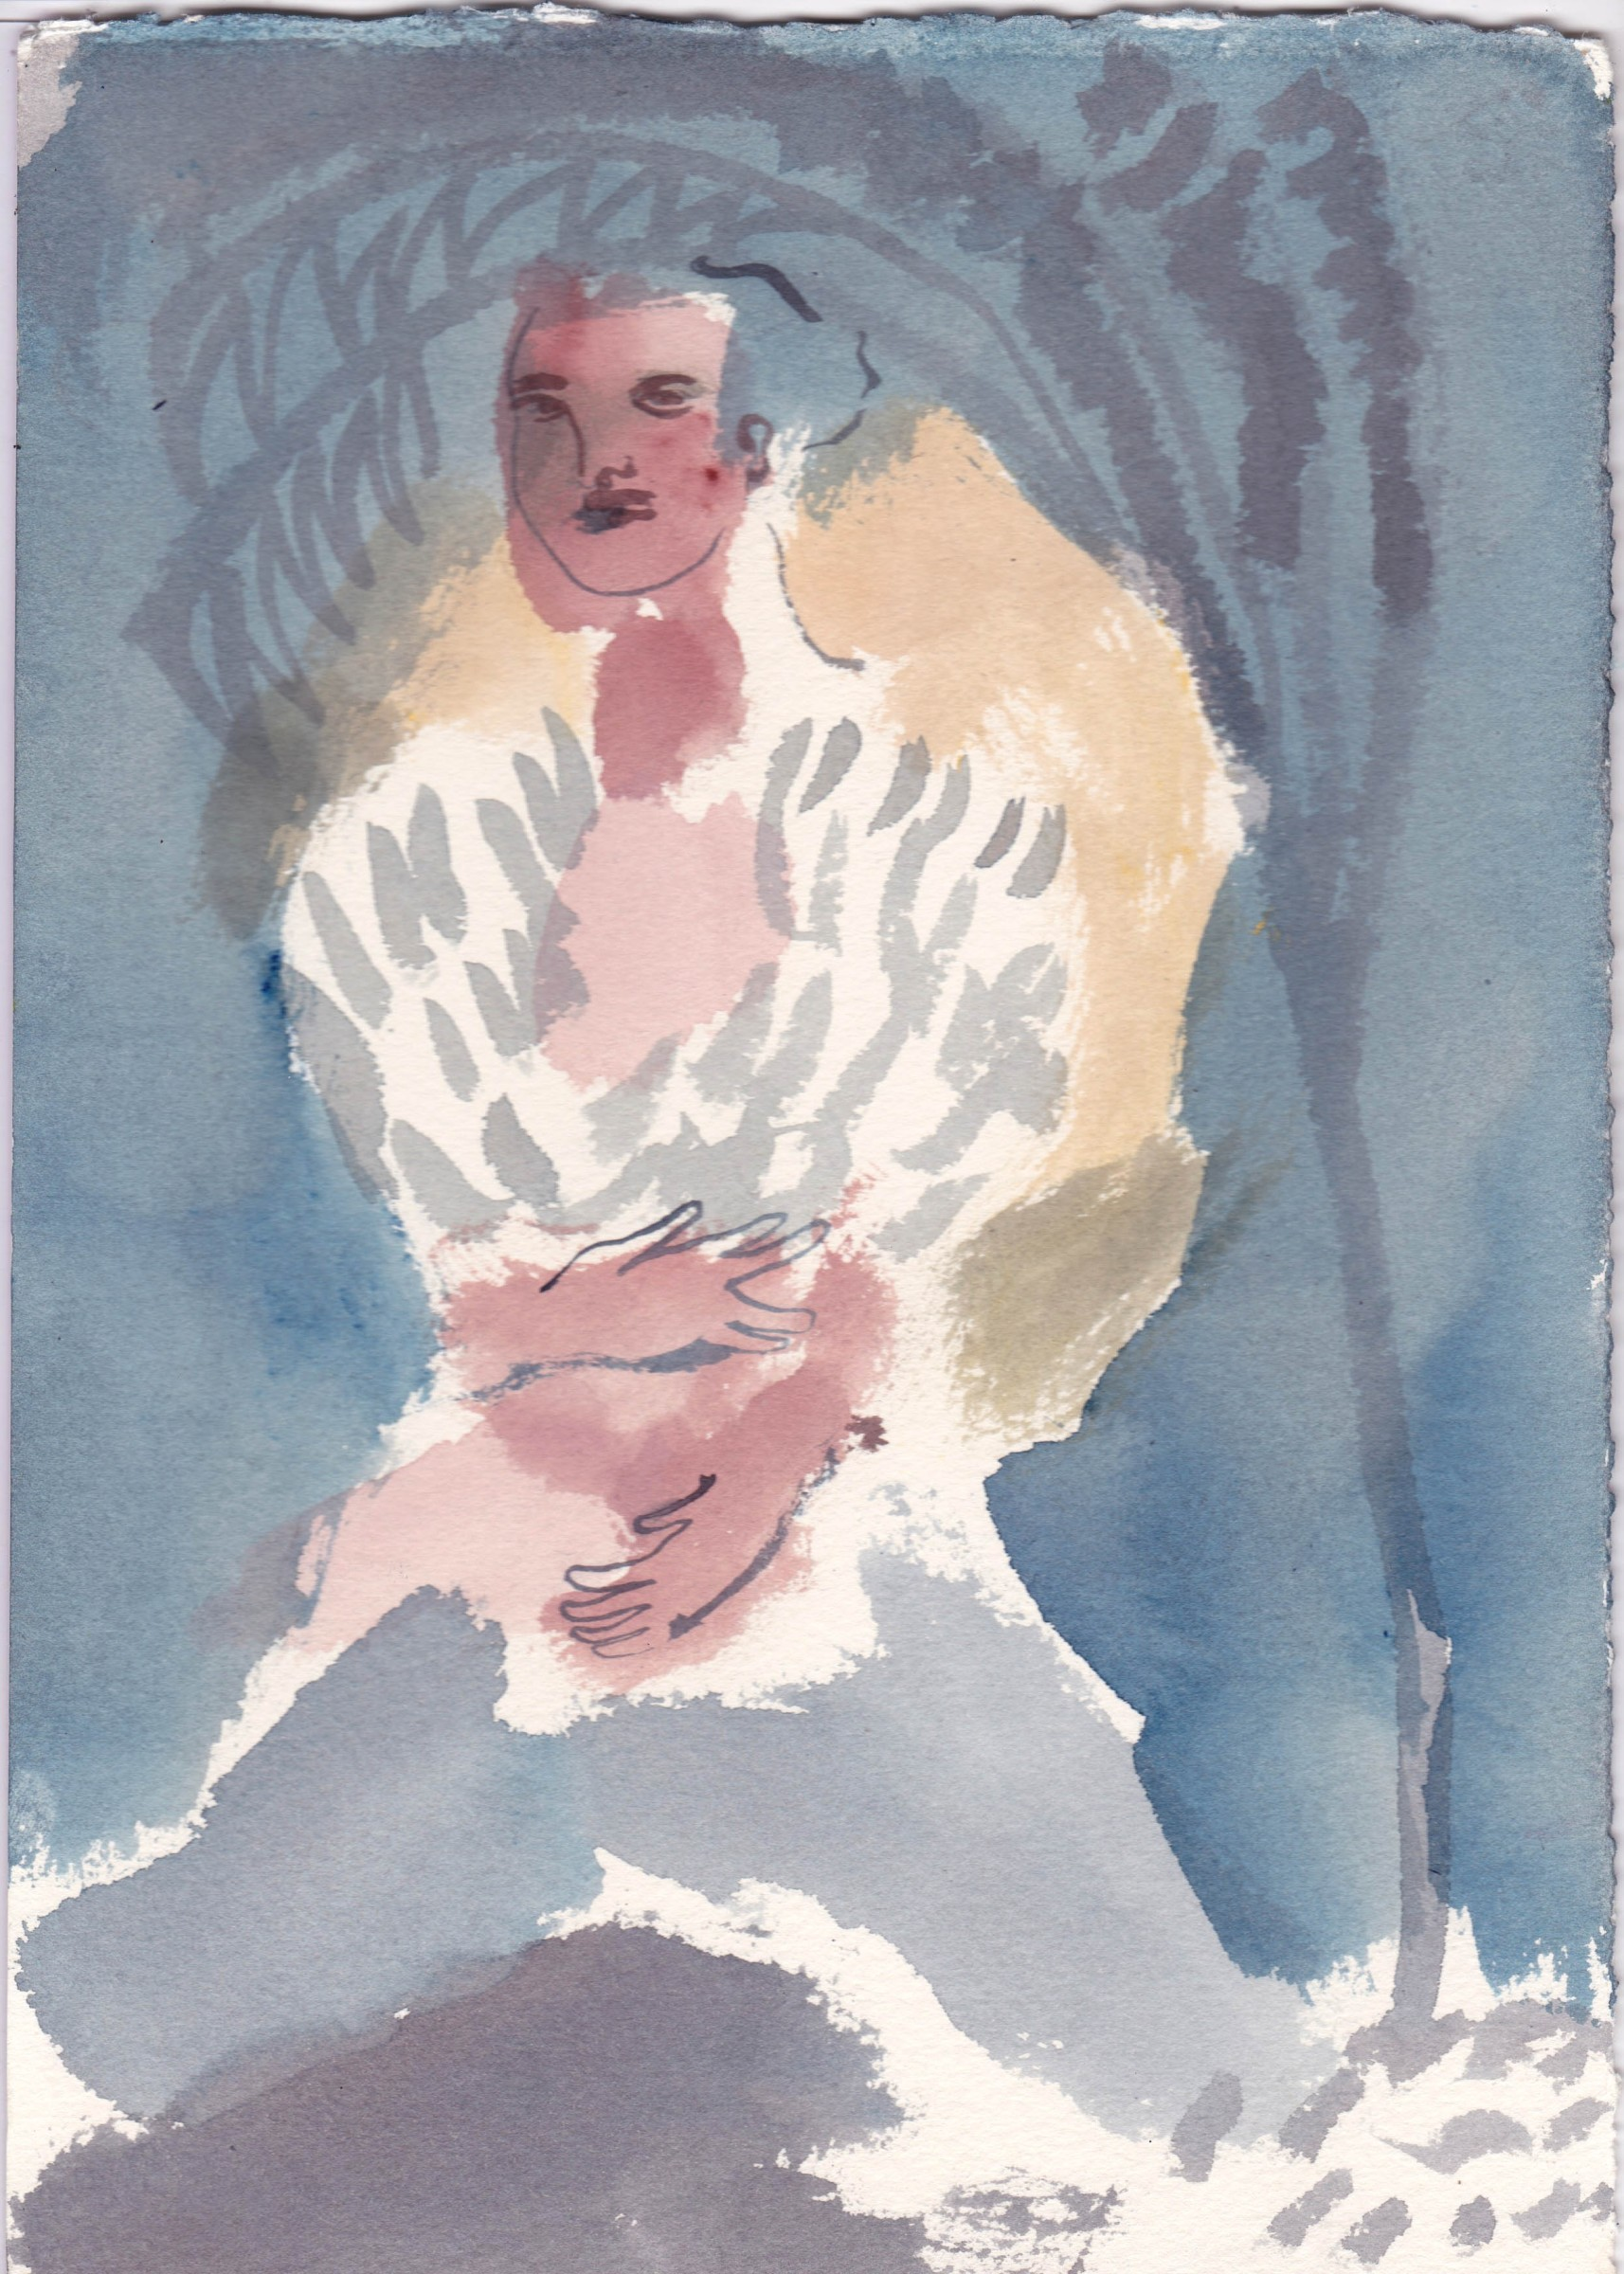 "<span class=""link fancybox-details-link""><a href=""/artists/394-jessica-jane-charleston/works/12347-jessica-jane-charleston-belly-under-the-tree/"">View Detail Page</a></span><div class=""artist""><span class=""artist""><strong>Jessica Jane Charleston</strong></span></div><div class=""title""><em>Belly Under the Tree</em></div><div class=""medium"">watercolour</div><div class=""dimensions"">Artwork: 29 x 20.5cm</div><div class=""price"">£300.00</div>"